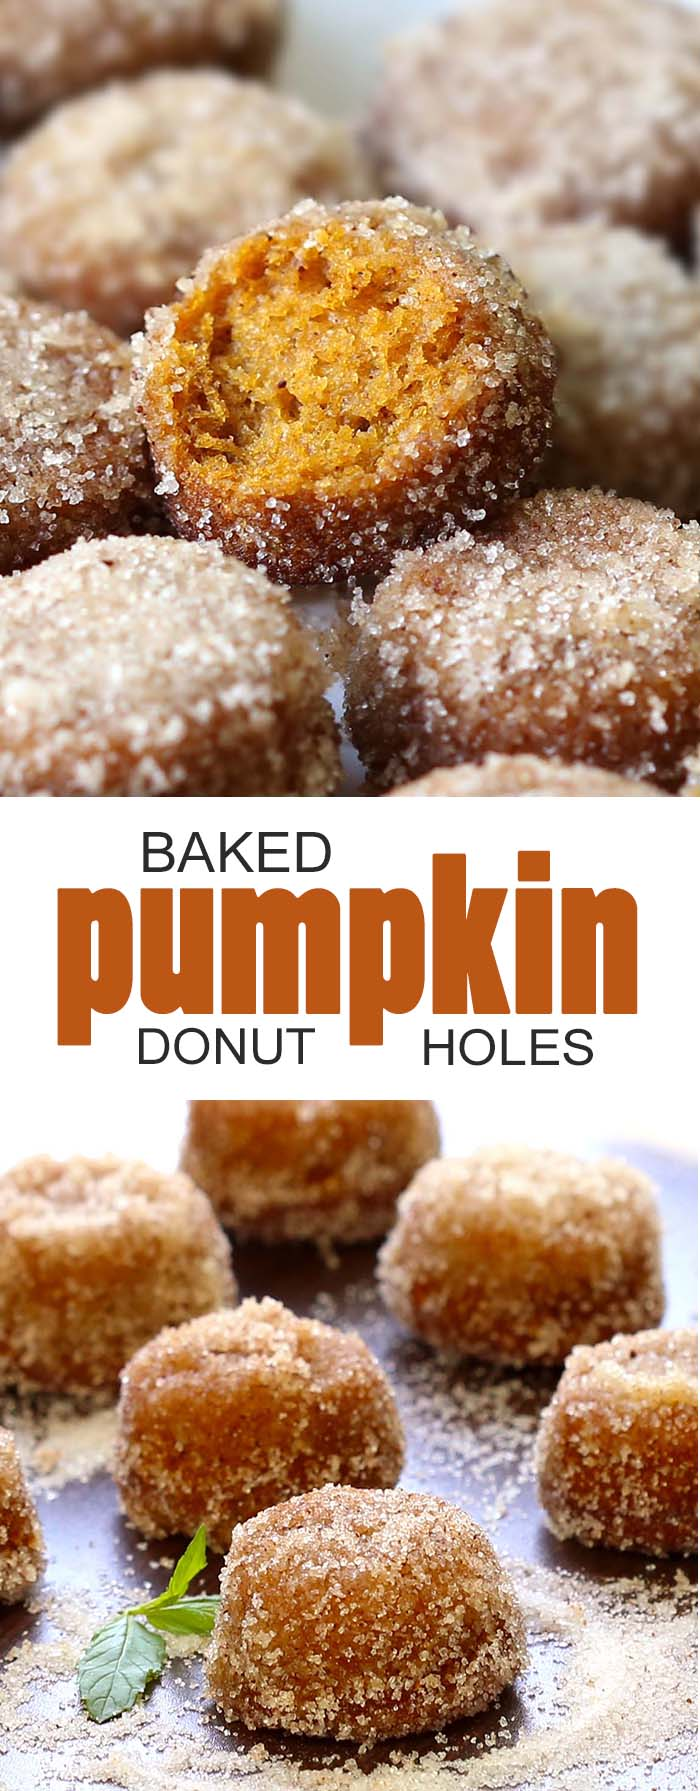 Baked Pumpkin Donut Holes | Cakescottage